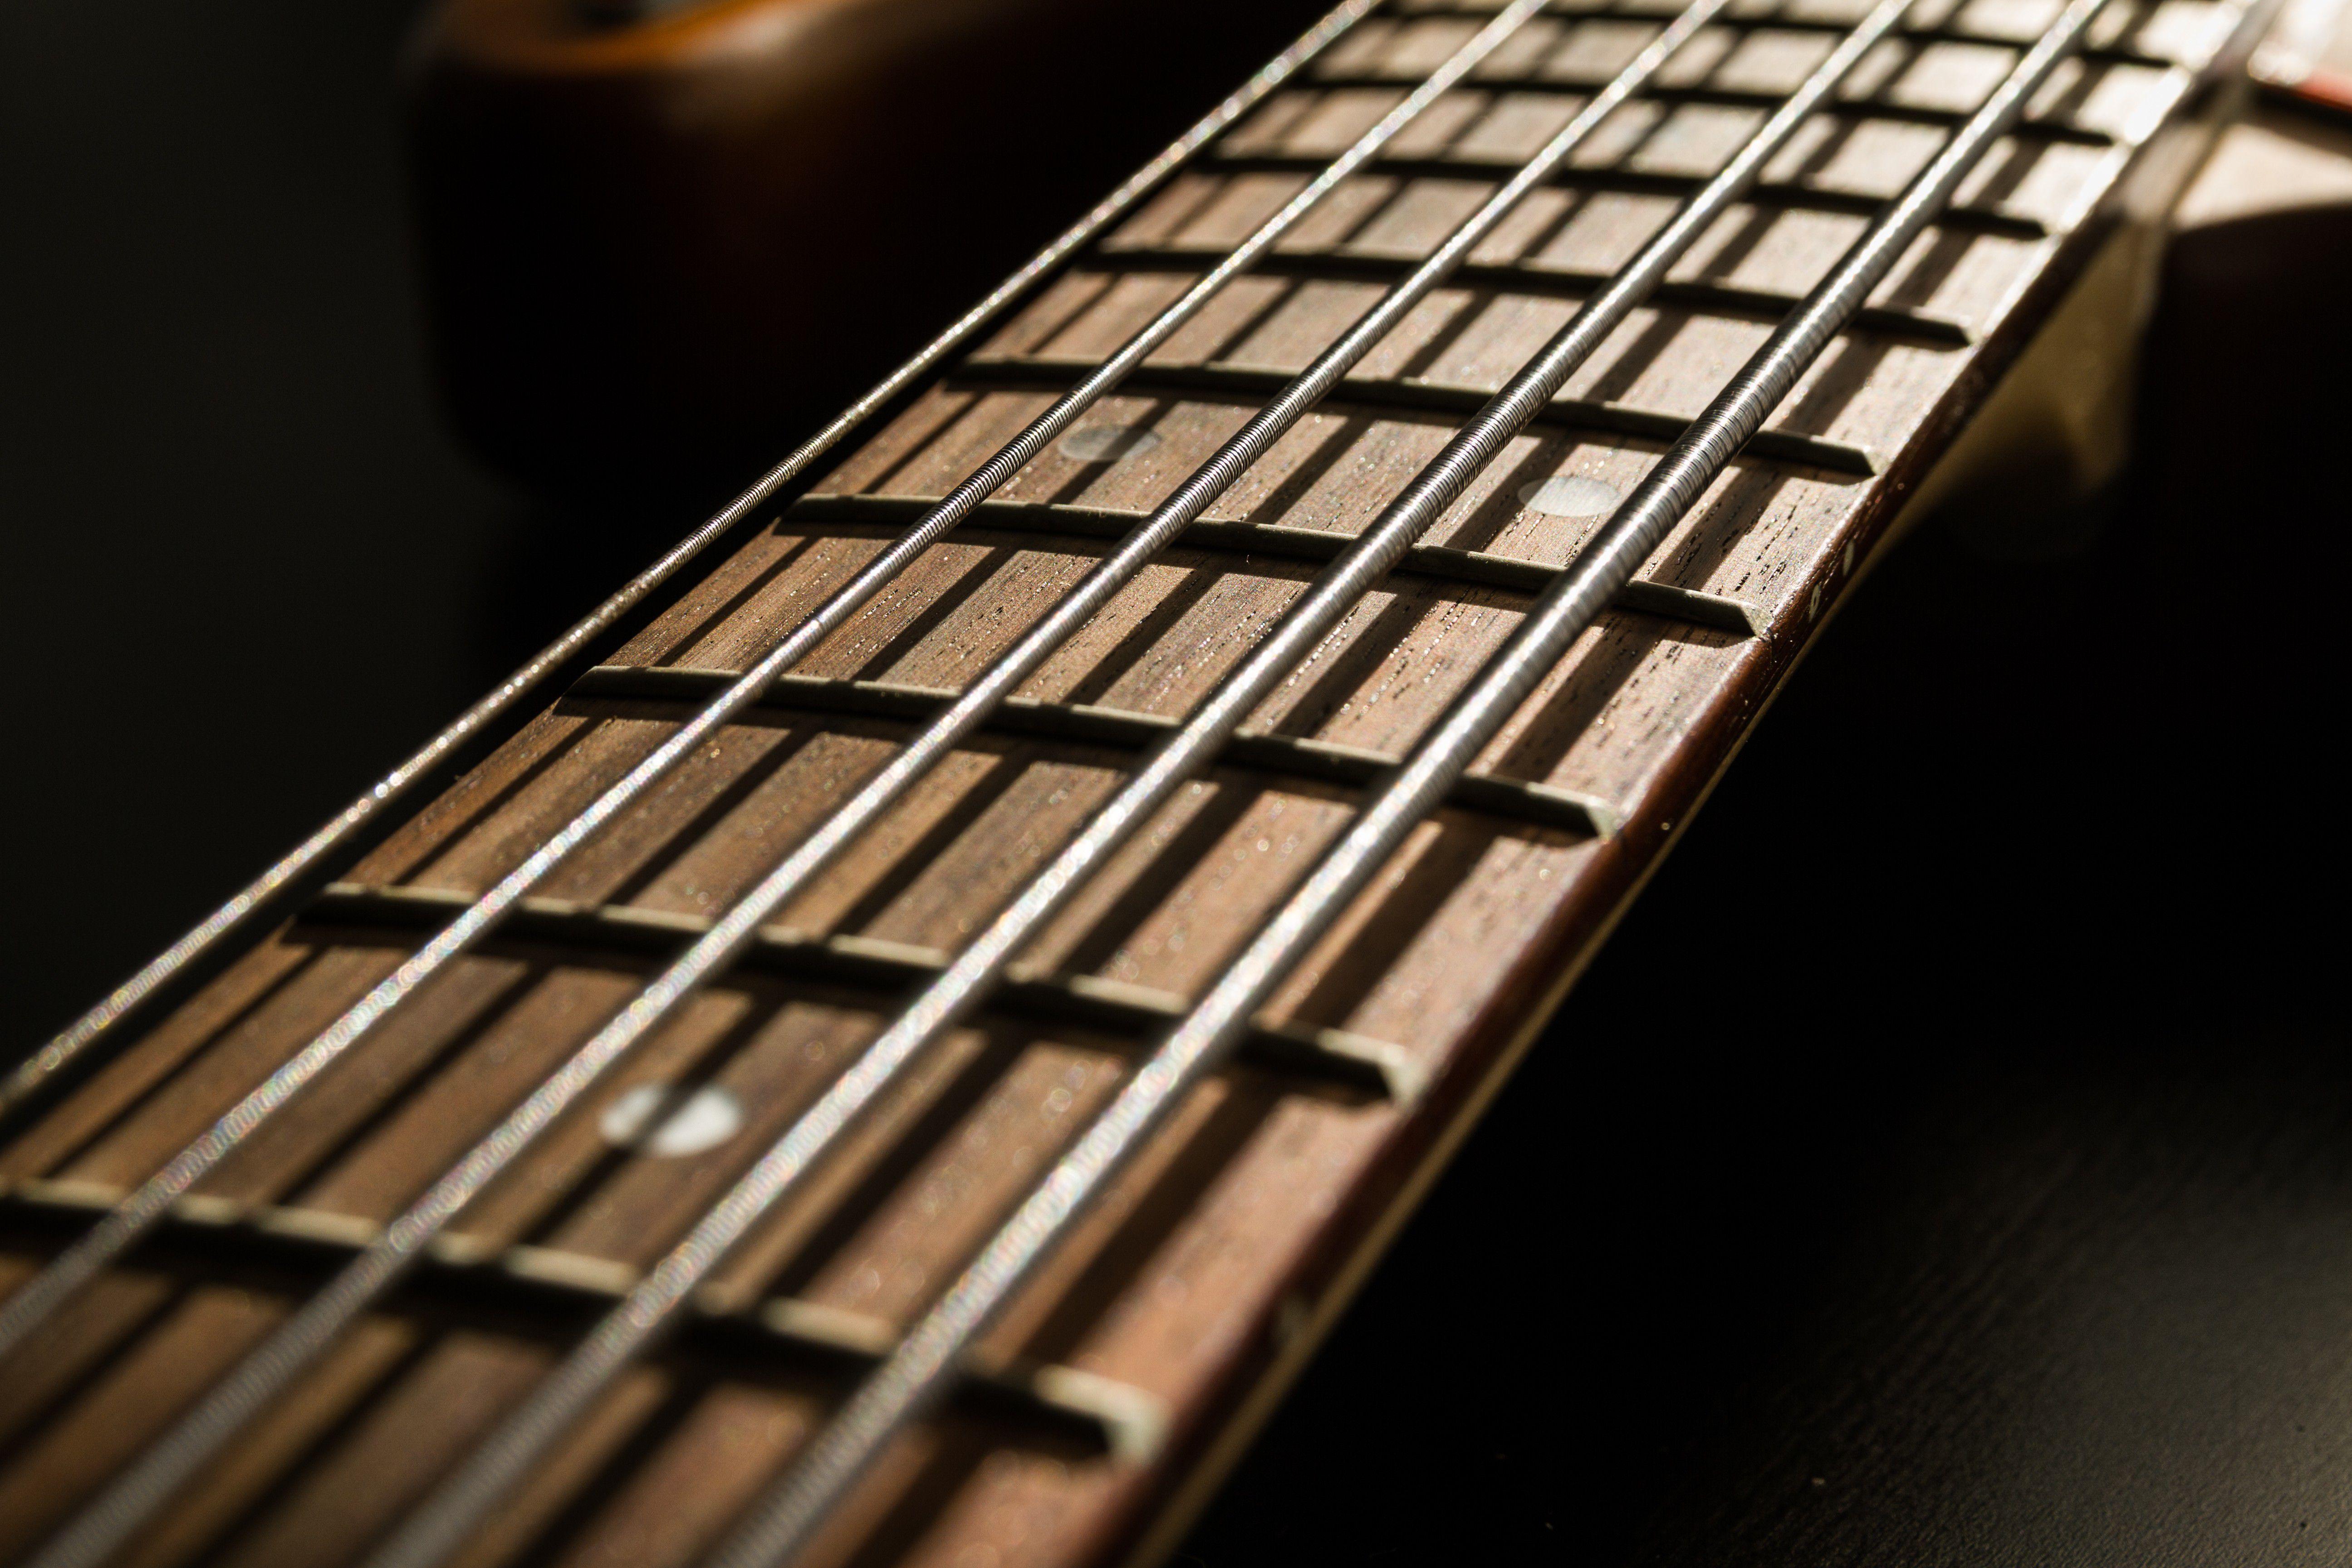 parts of the bass guitar. Black Bedroom Furniture Sets. Home Design Ideas